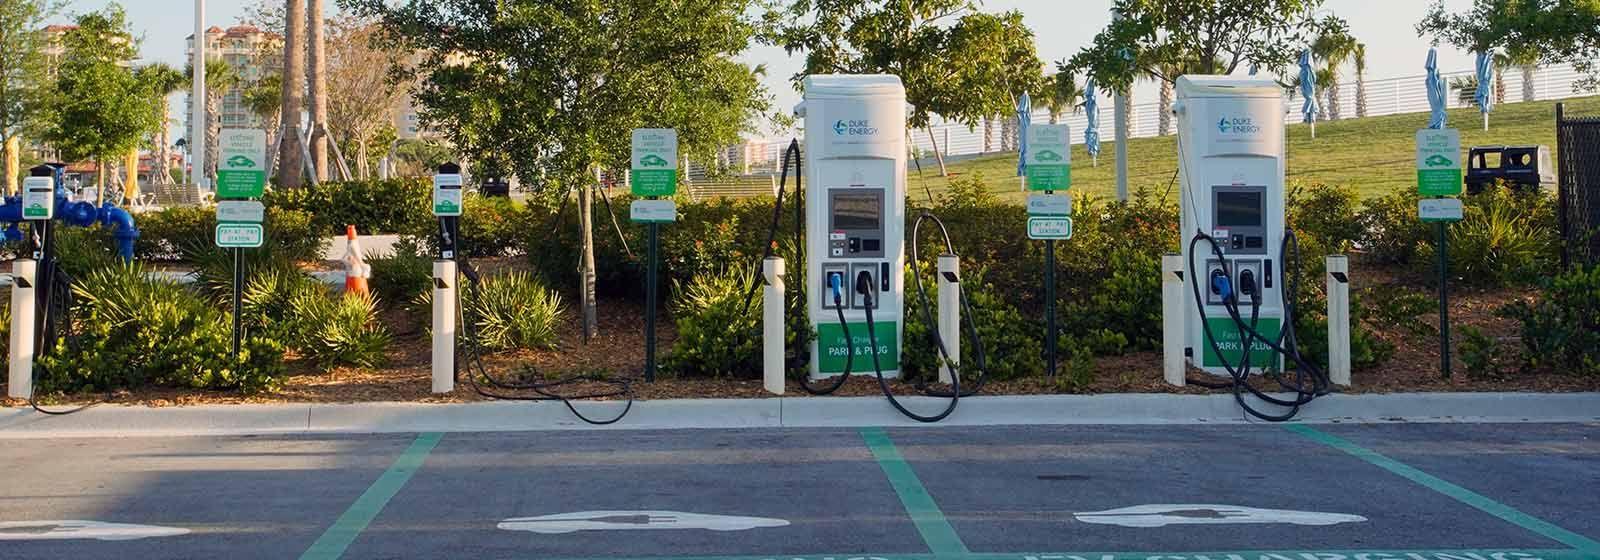 DUKE ILLUMINATION – Electric vehicle charging stations are growing nationwide